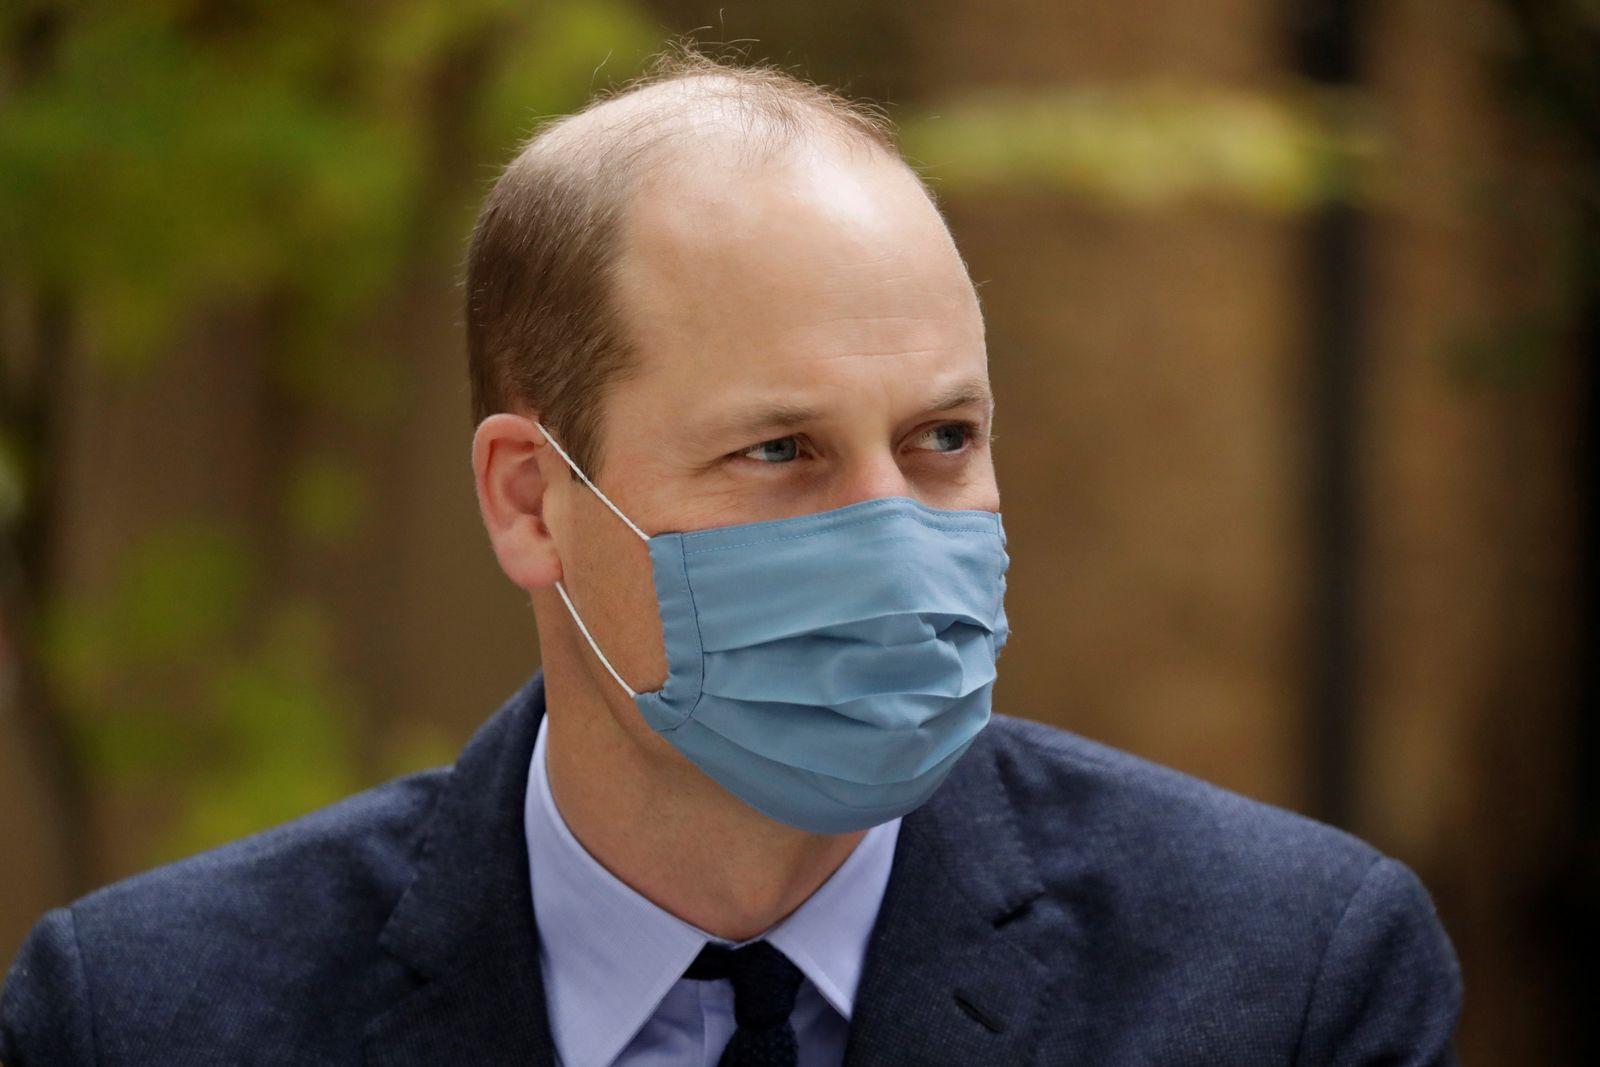 Britain's Prince William and Catherine, Duchess of Cambridge visit St. Bartholomew's Hospital in London